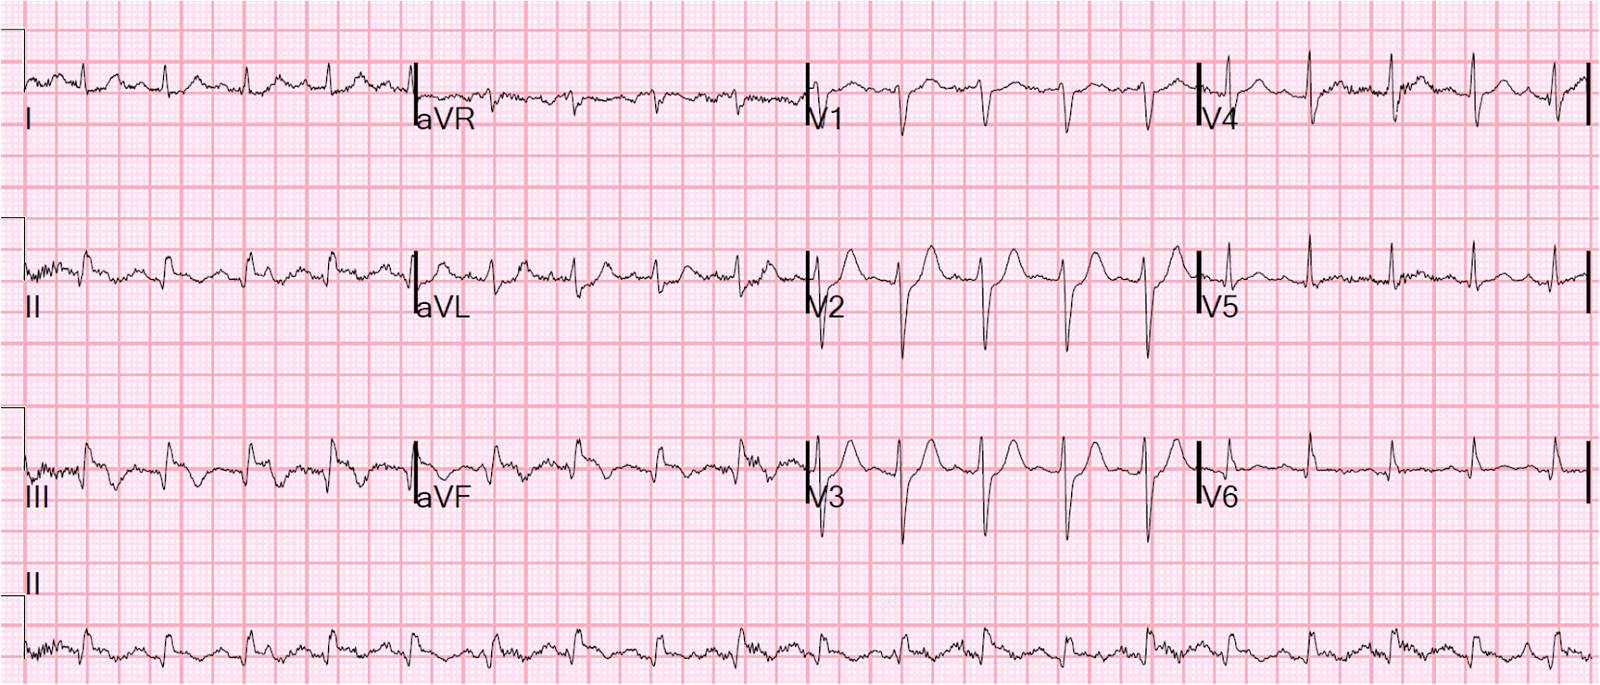 Dr Smith S Ecg Blog Pulmonary Edema Hypertension And